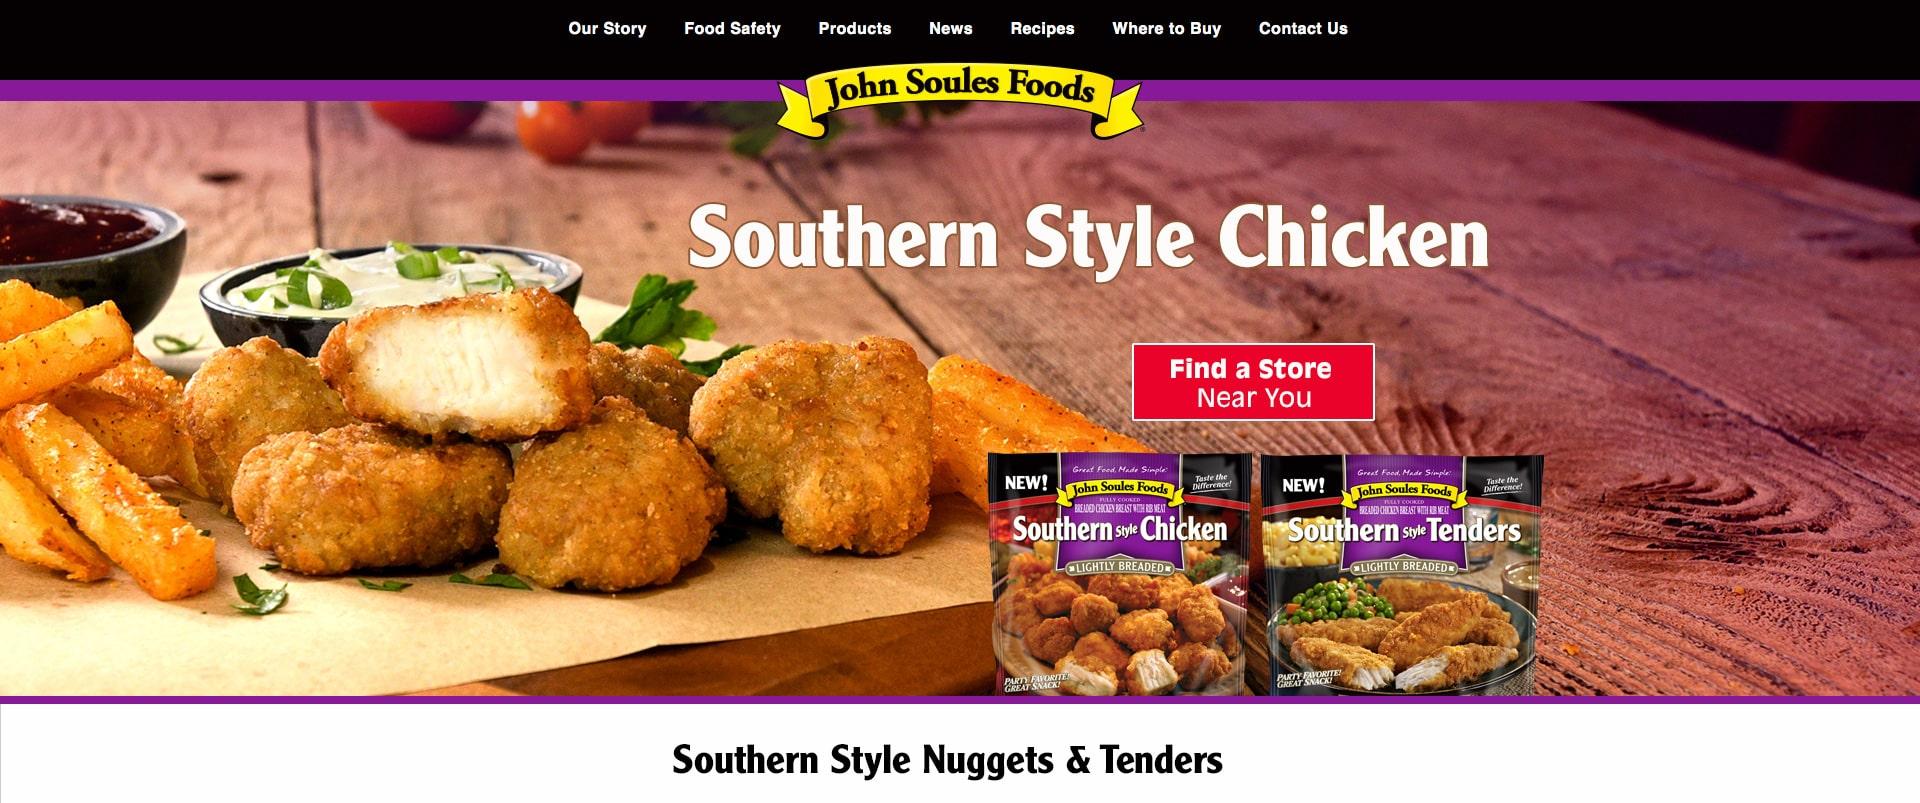 John Soules Foods website